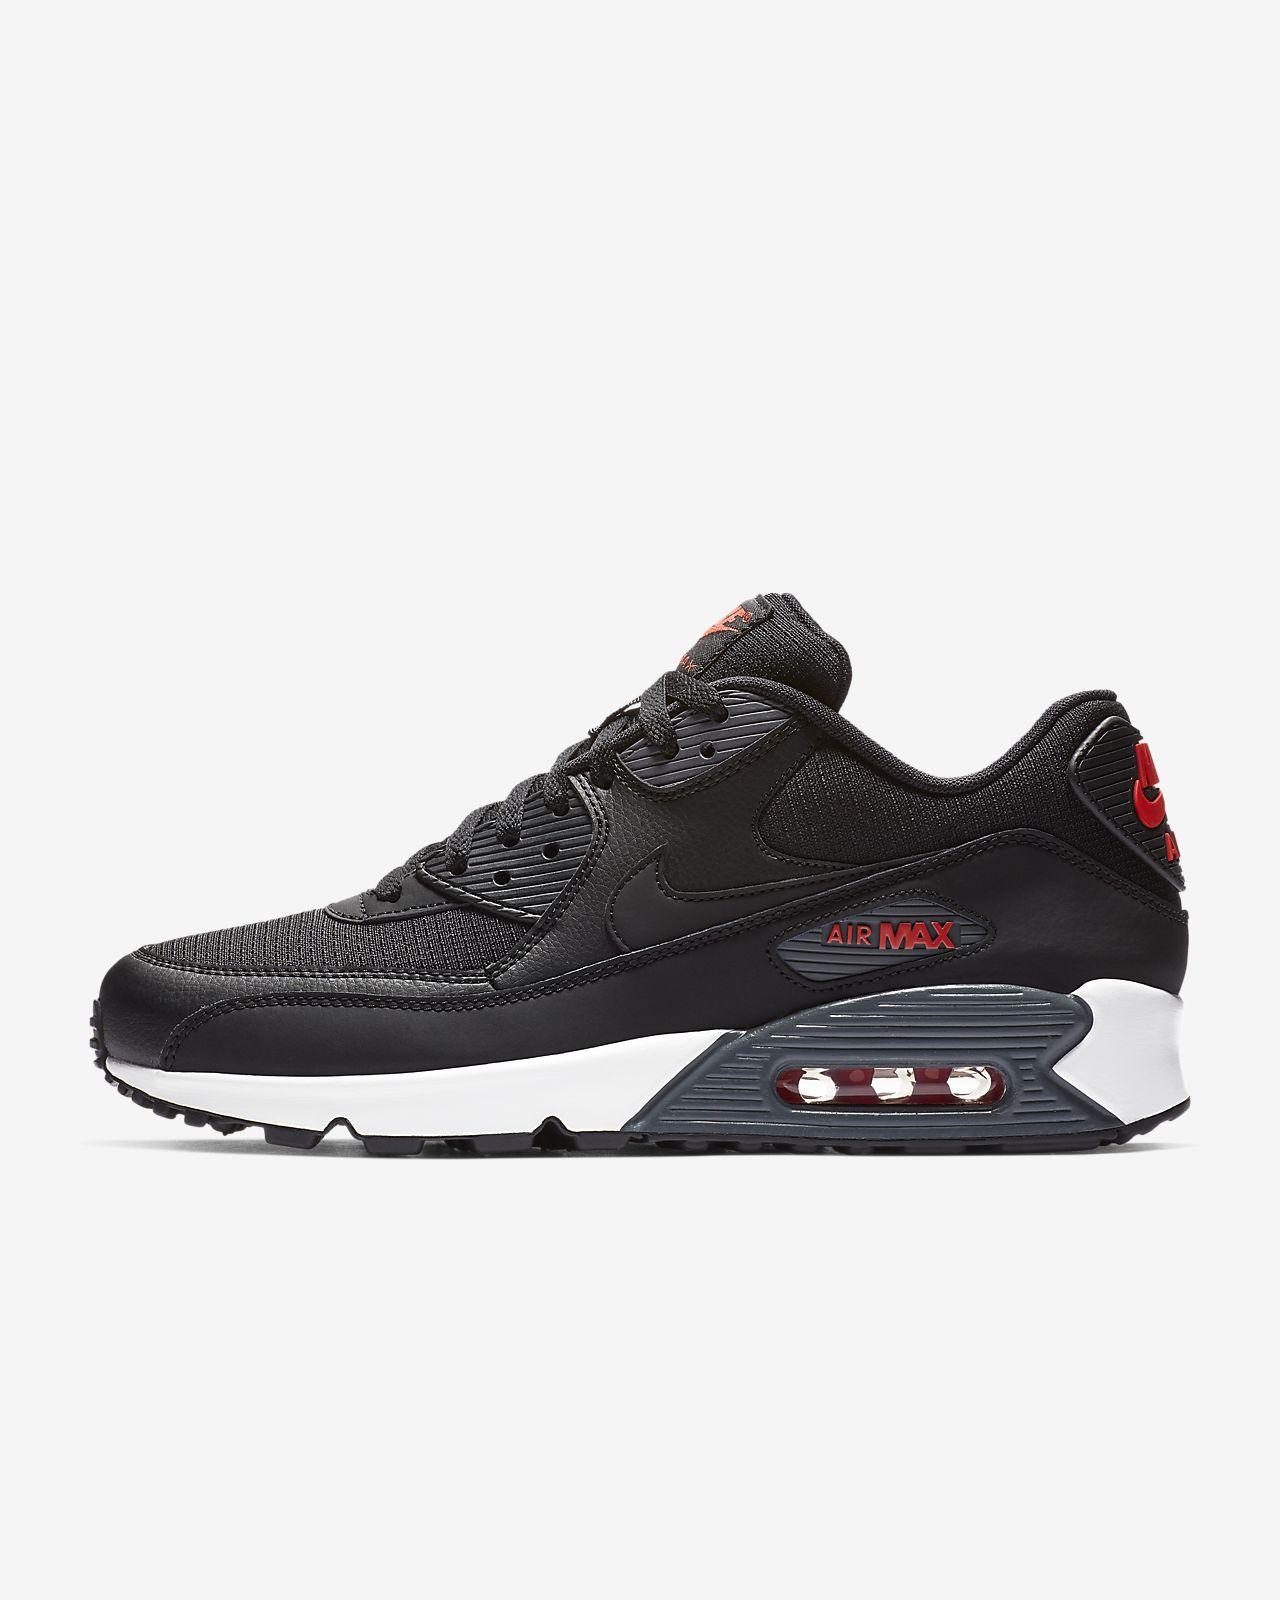 innovative design f8213 1eda7 ... Nike Air Max 90 SE férficipő